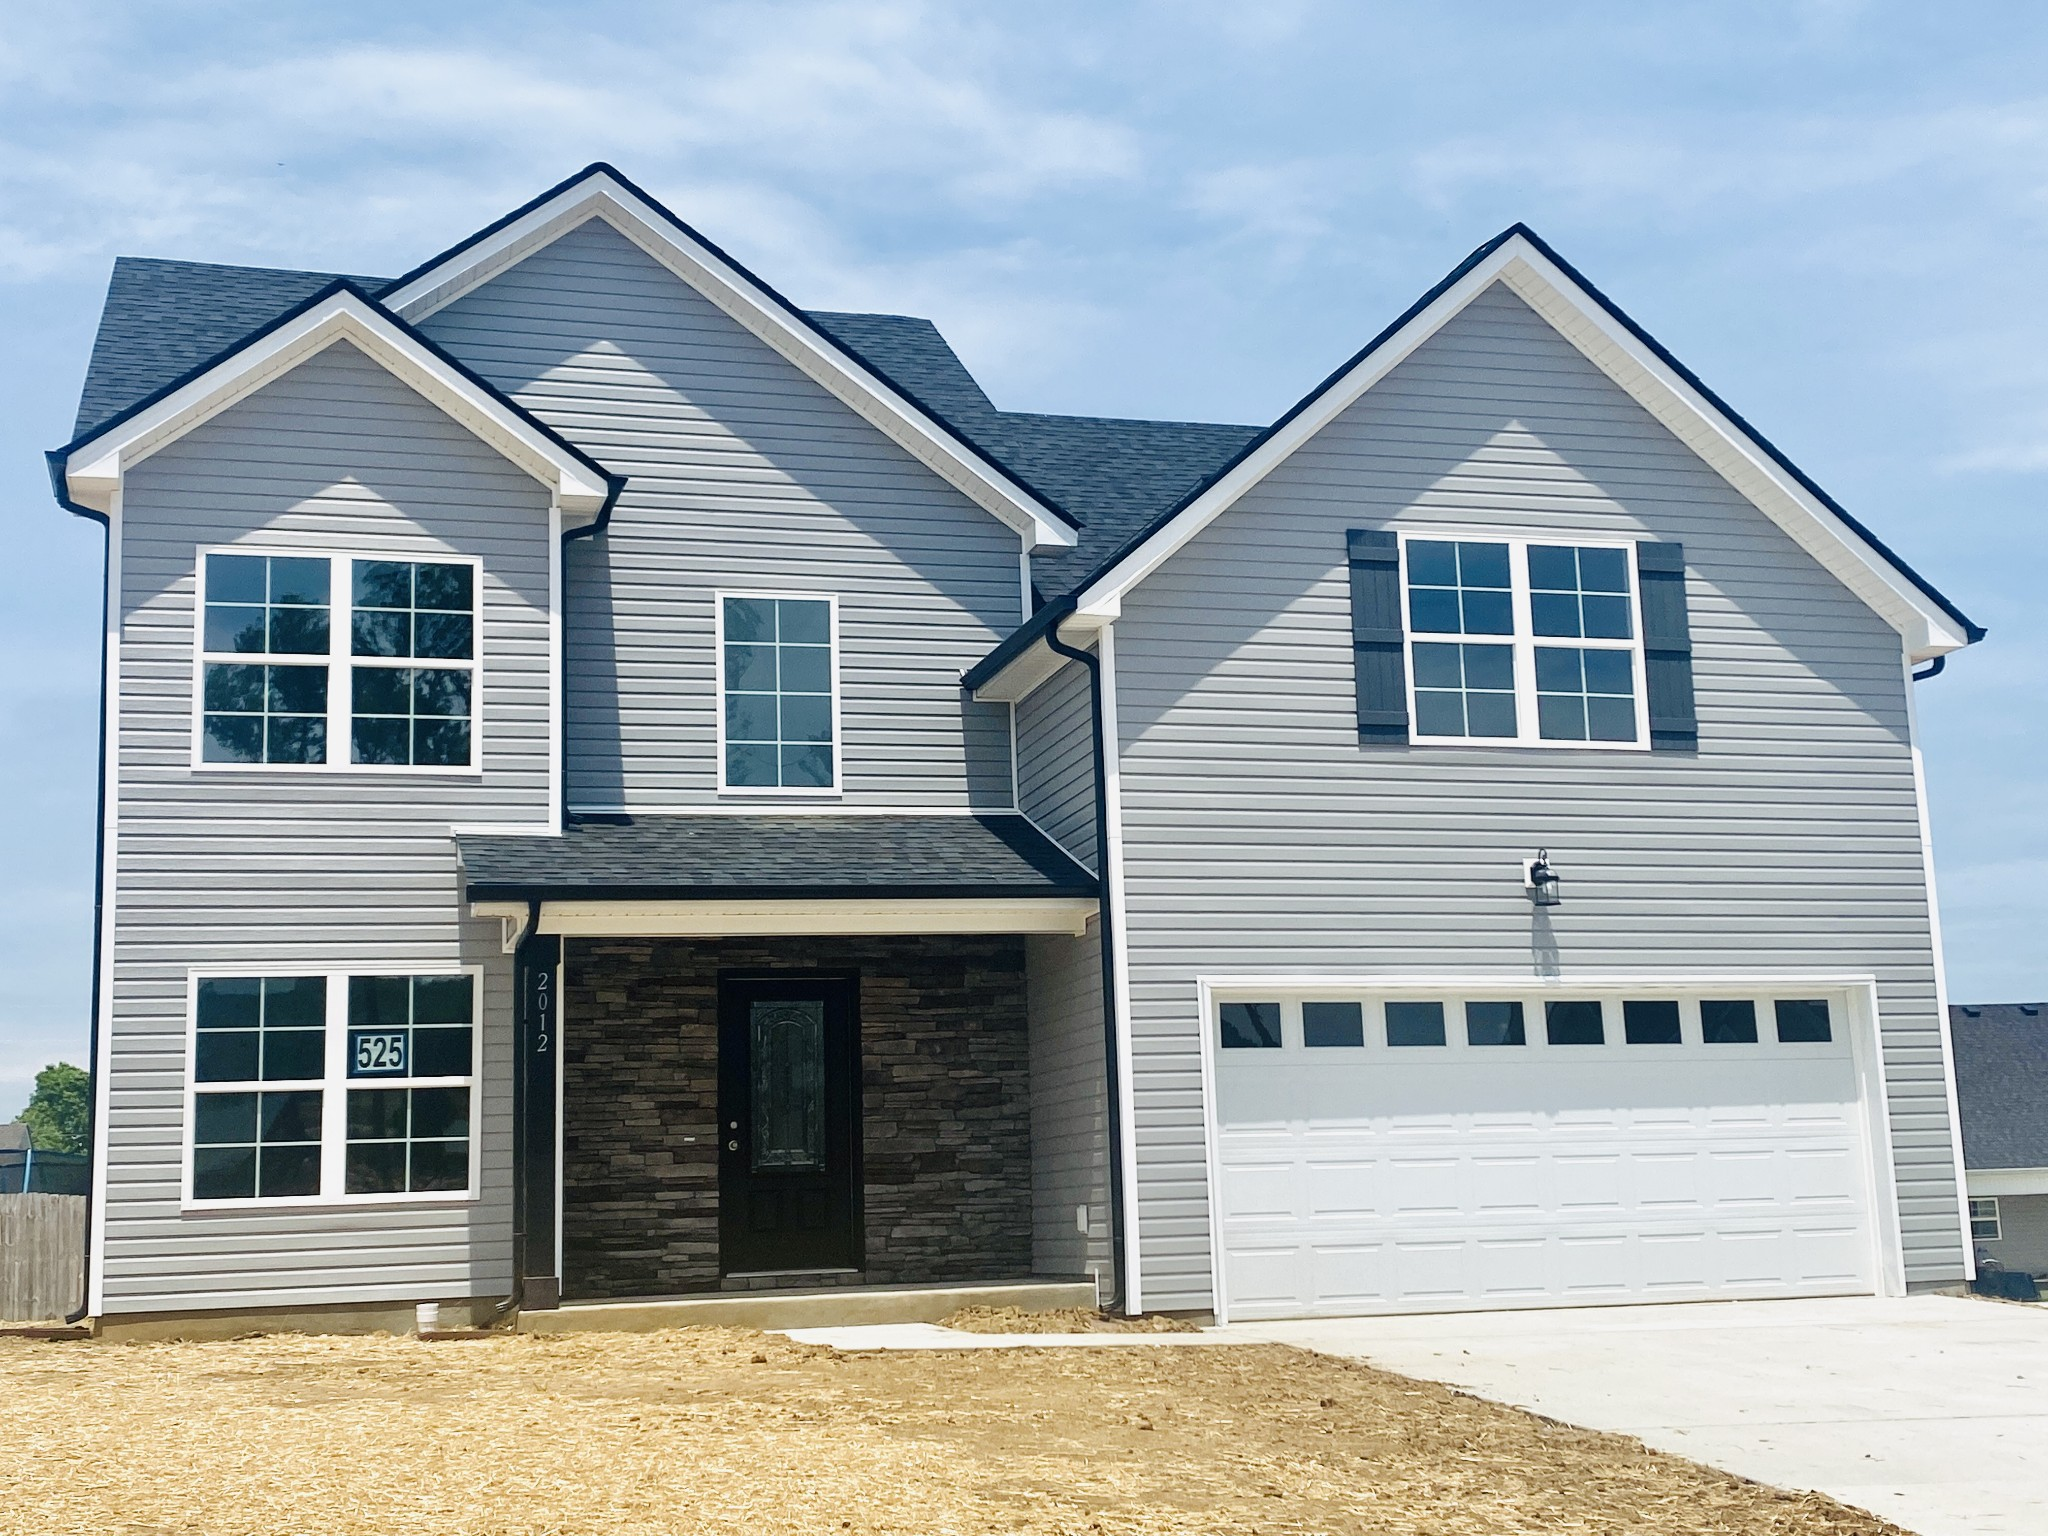 2012 Hackensack Ln, Property Photo - Smyrna, TN real estate listing